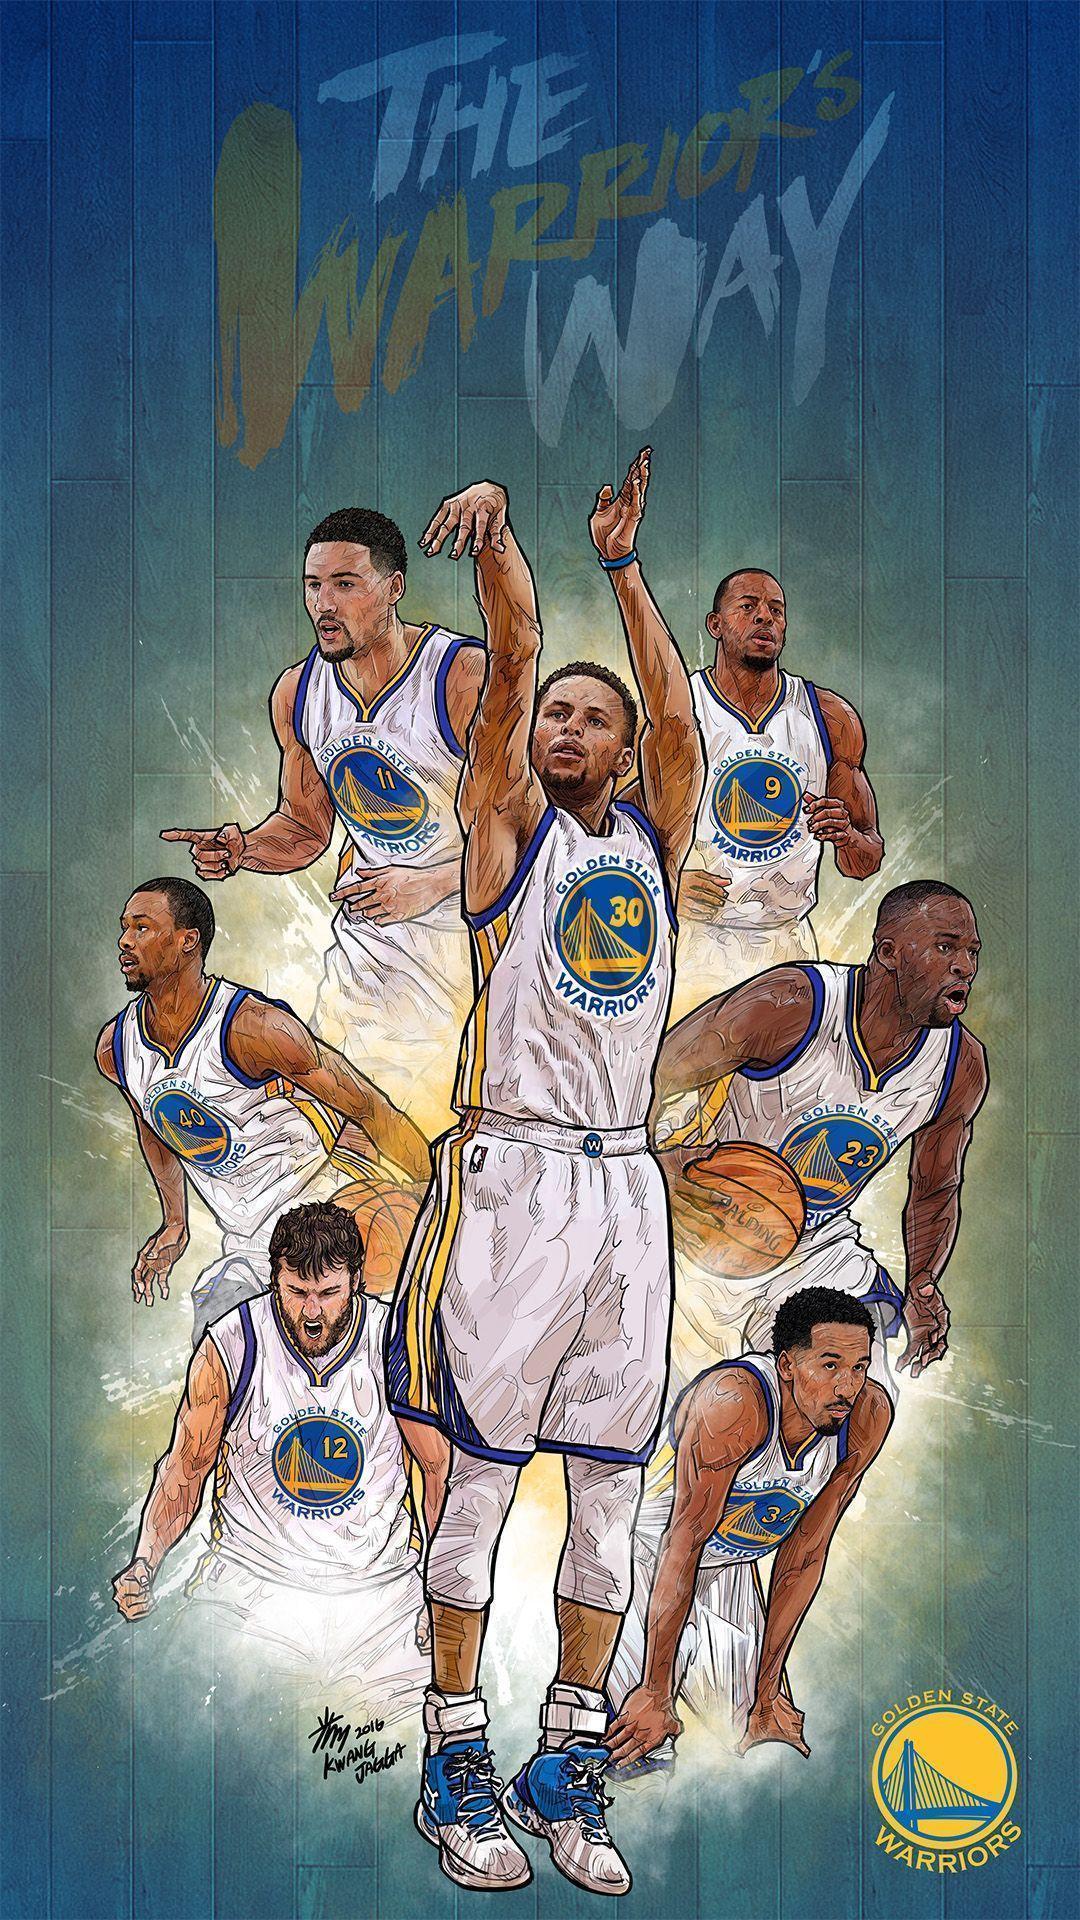 Golden State Warriors 2017 Wallpapers - Wallpaper Cave